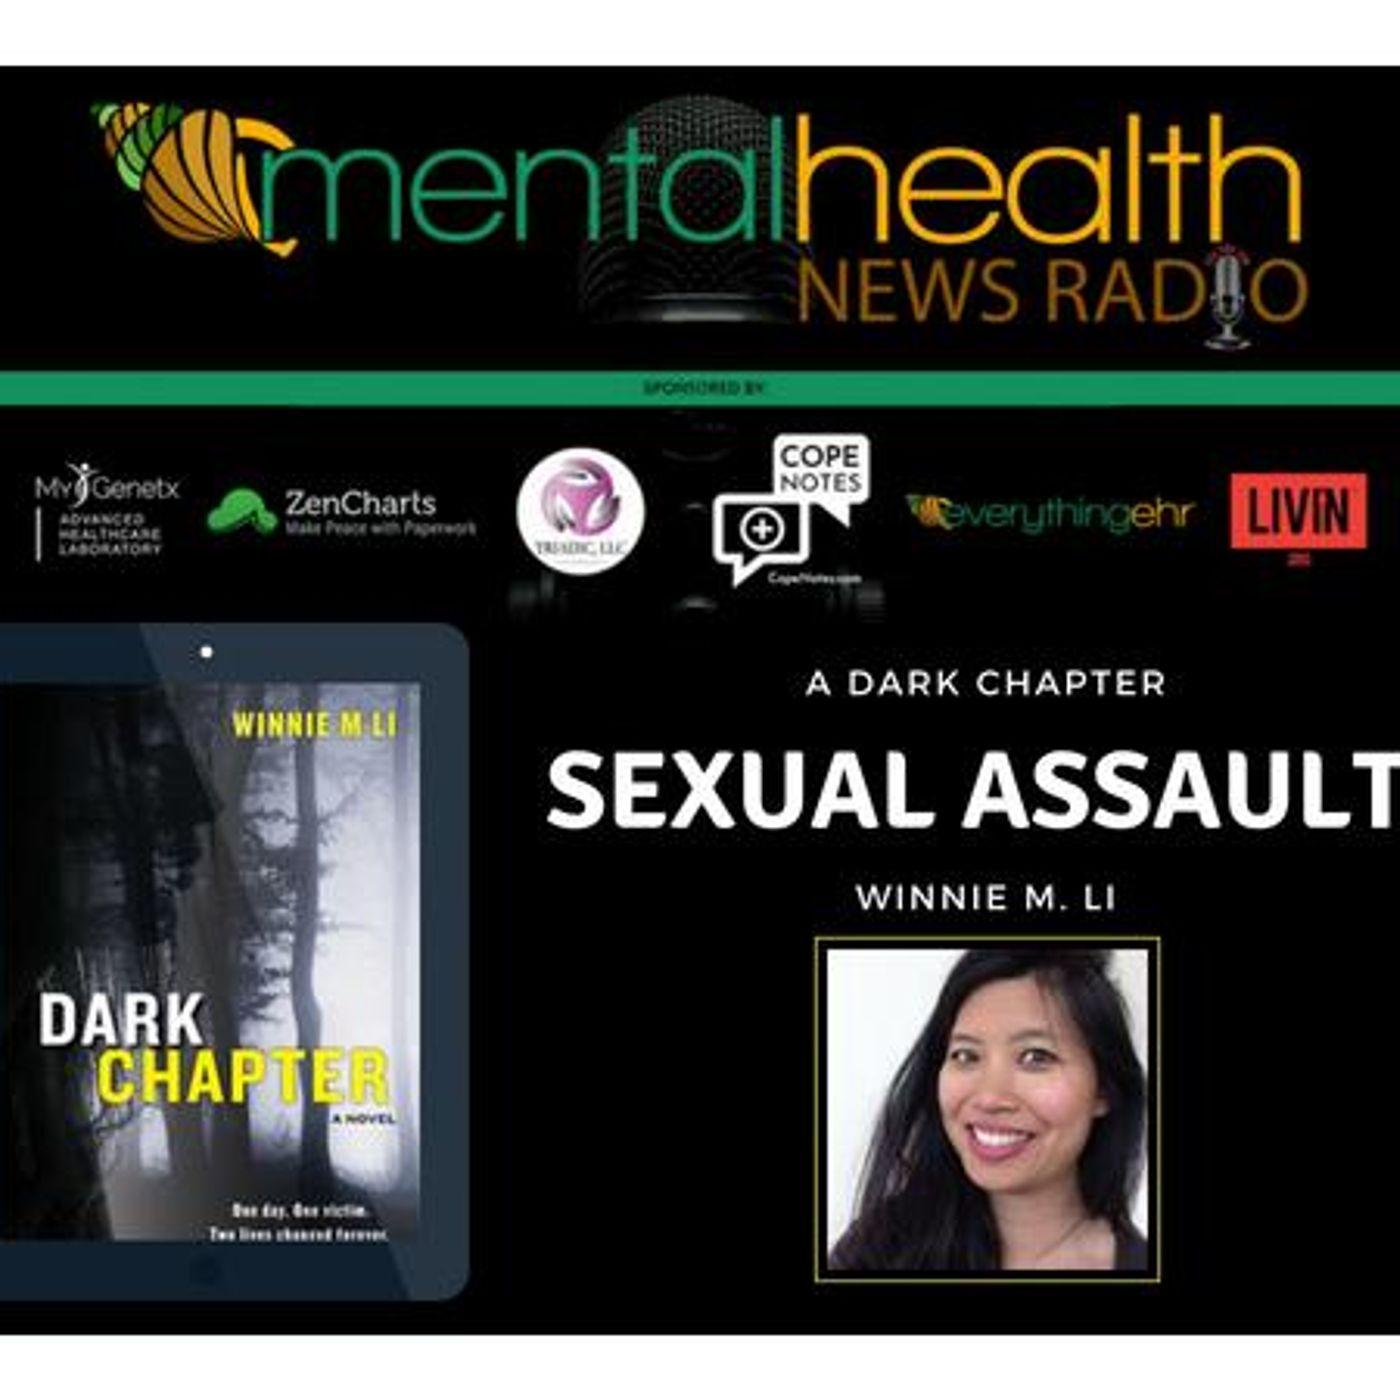 Mental Health News Radio - A Dark Chapter of Sexual Assault with Winnie M Li